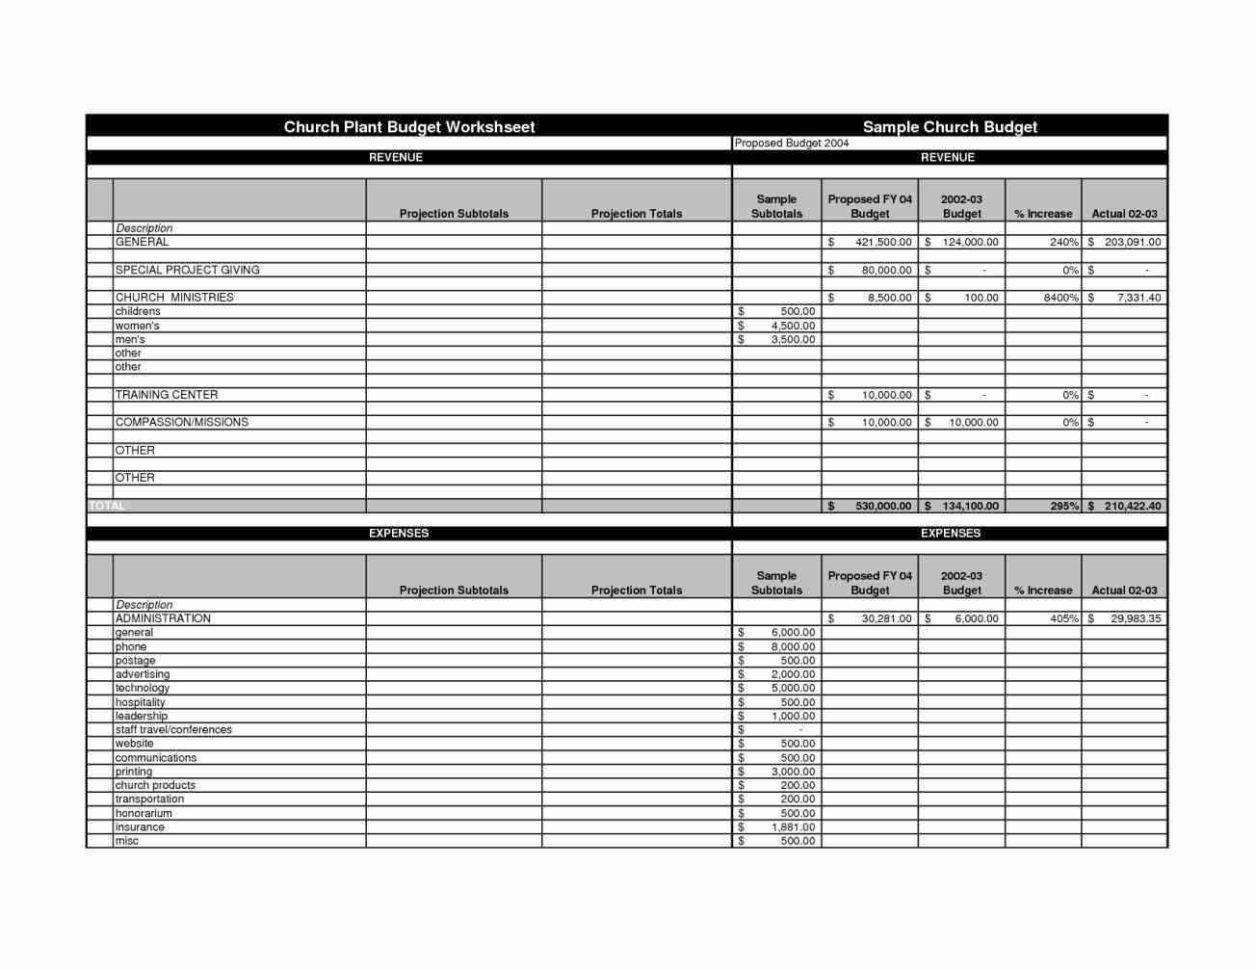 Example Of Church Budget Spreadsheet Regarding Church Budget Spreadsheet Template  Haersheet